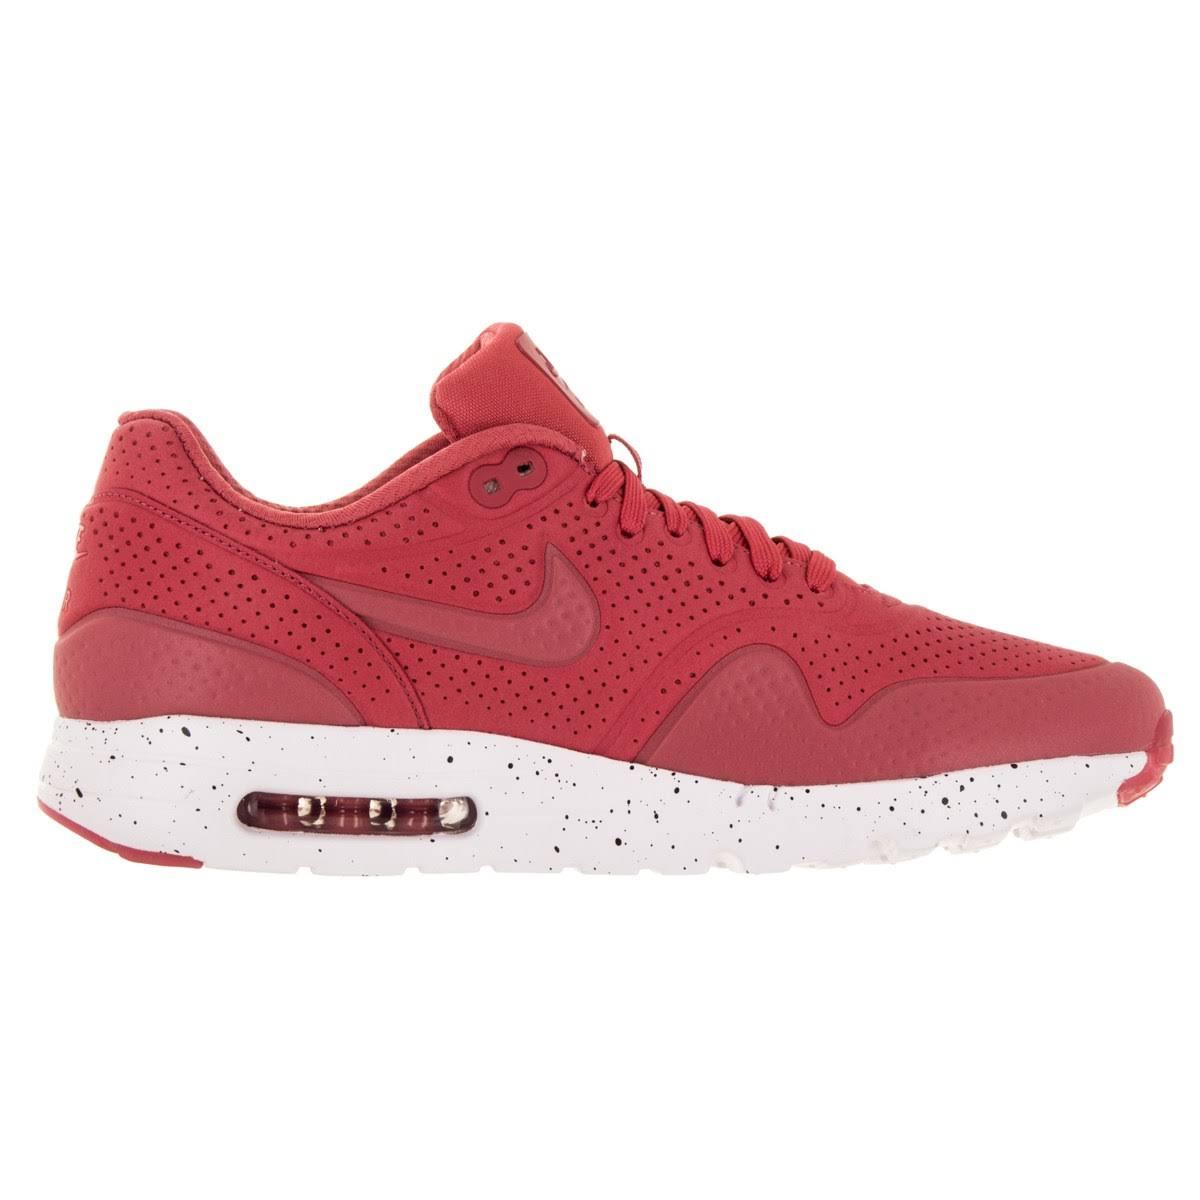 Terra Rojo Blanco Ultra Hombre Max Nike Air 611 1 Moire 705297 z8qnTnOwx